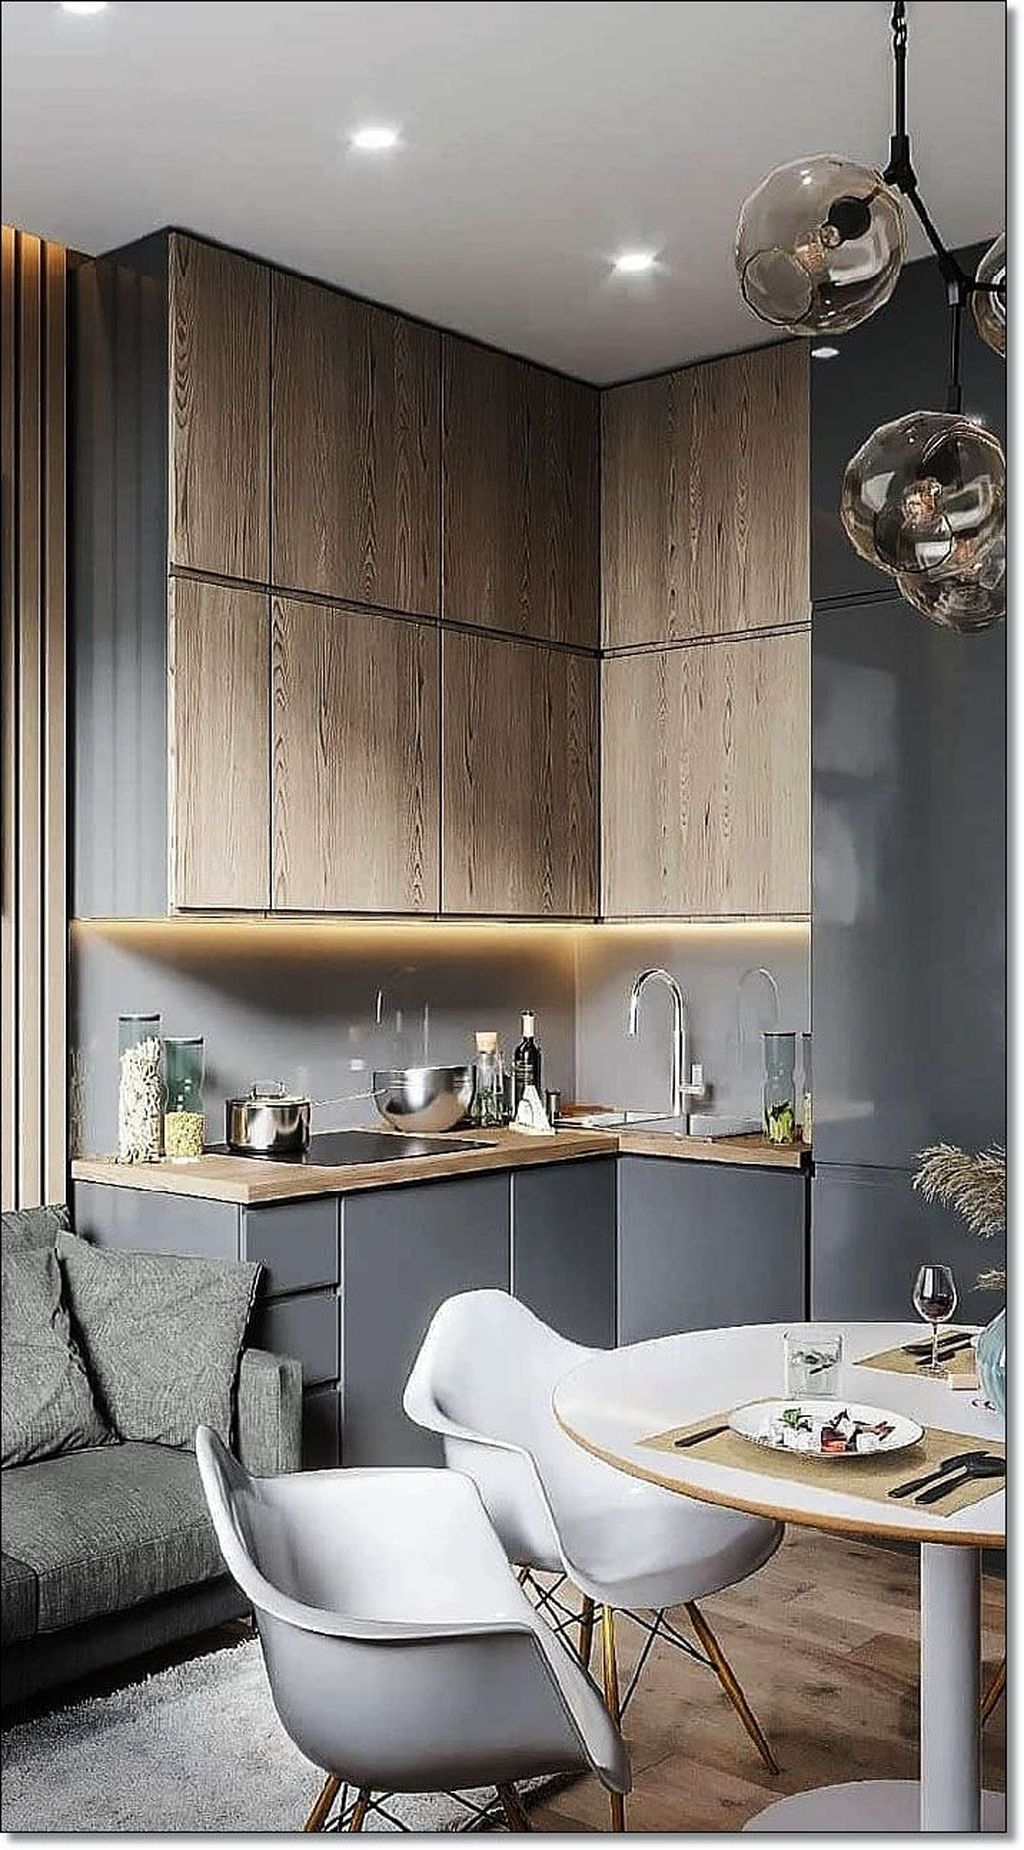 Brilliant Small Kitchen Remodel Design Ideas On A Budget 38